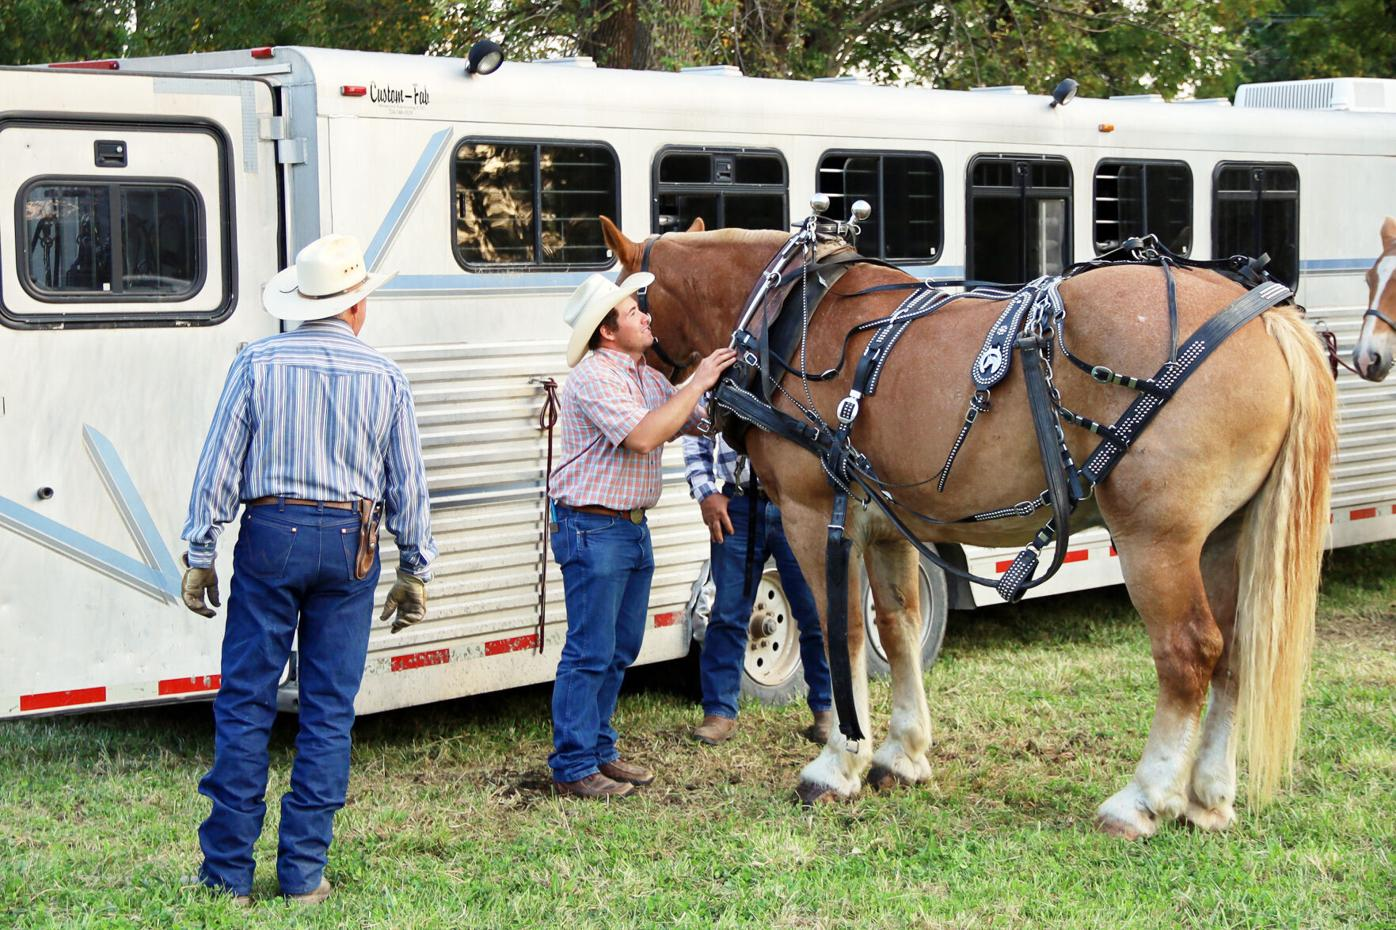 9-24-20 Pickering Horse Show 14.jpg